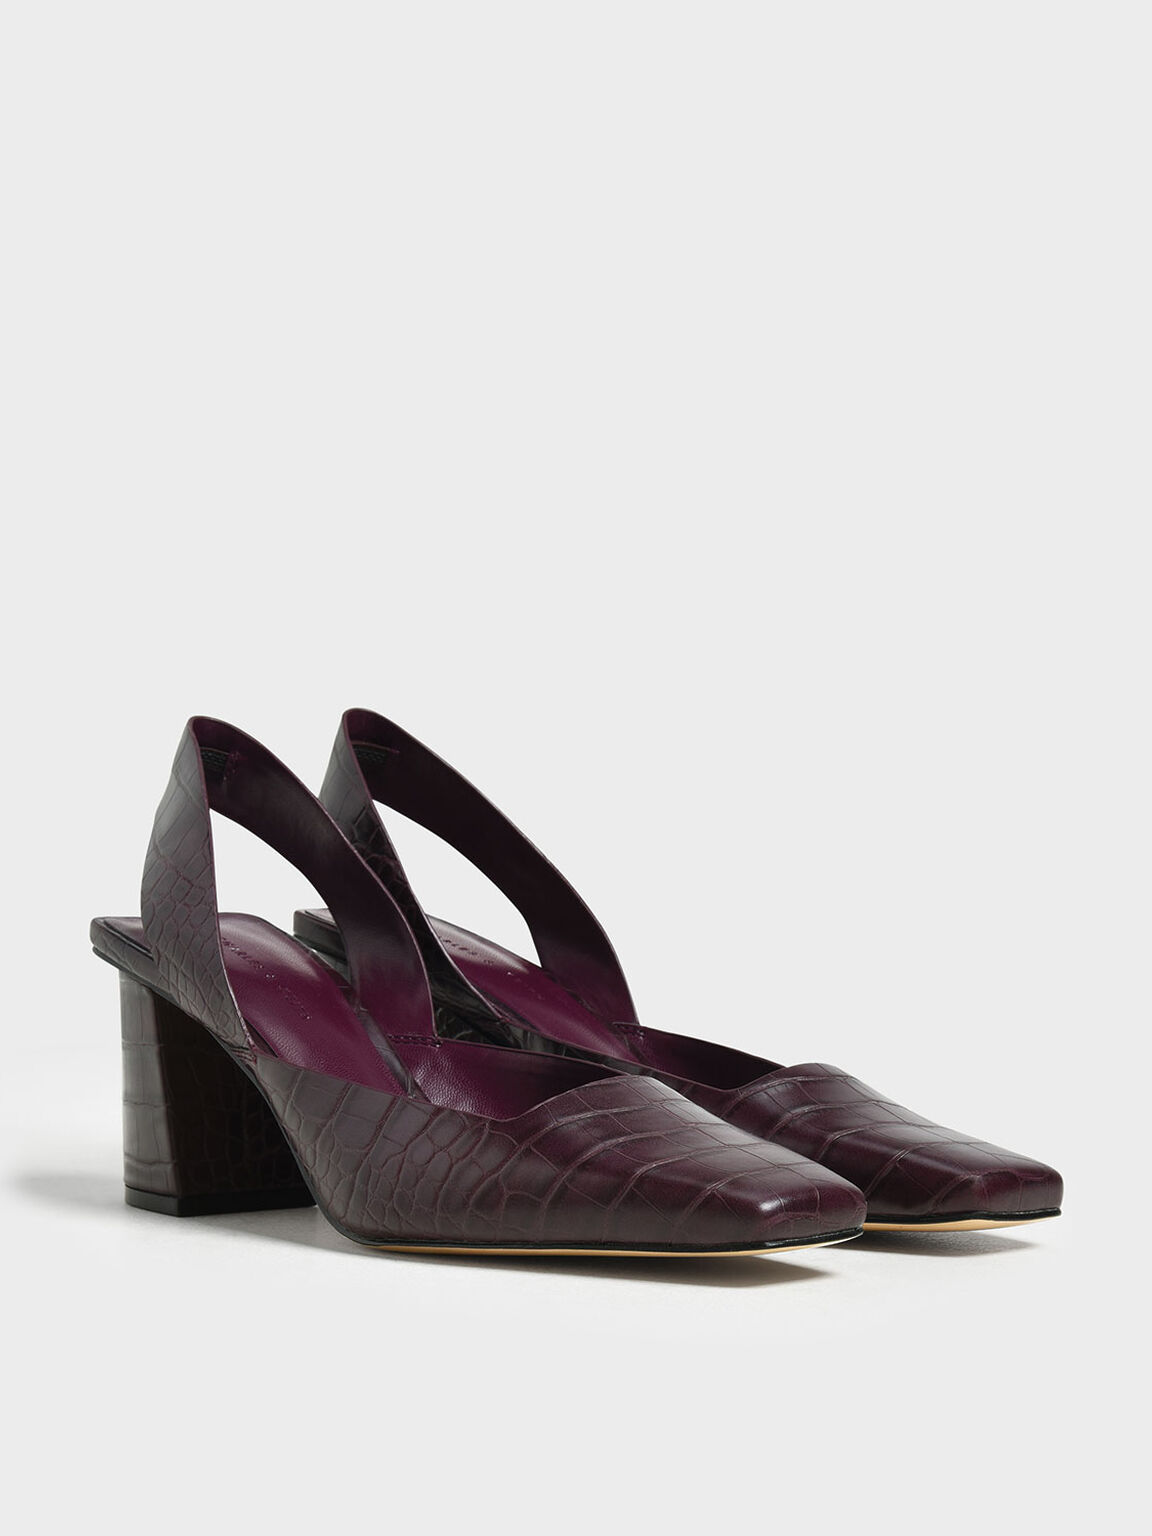 Croc-Effect Square Toe Block Heels, Prune, hi-res